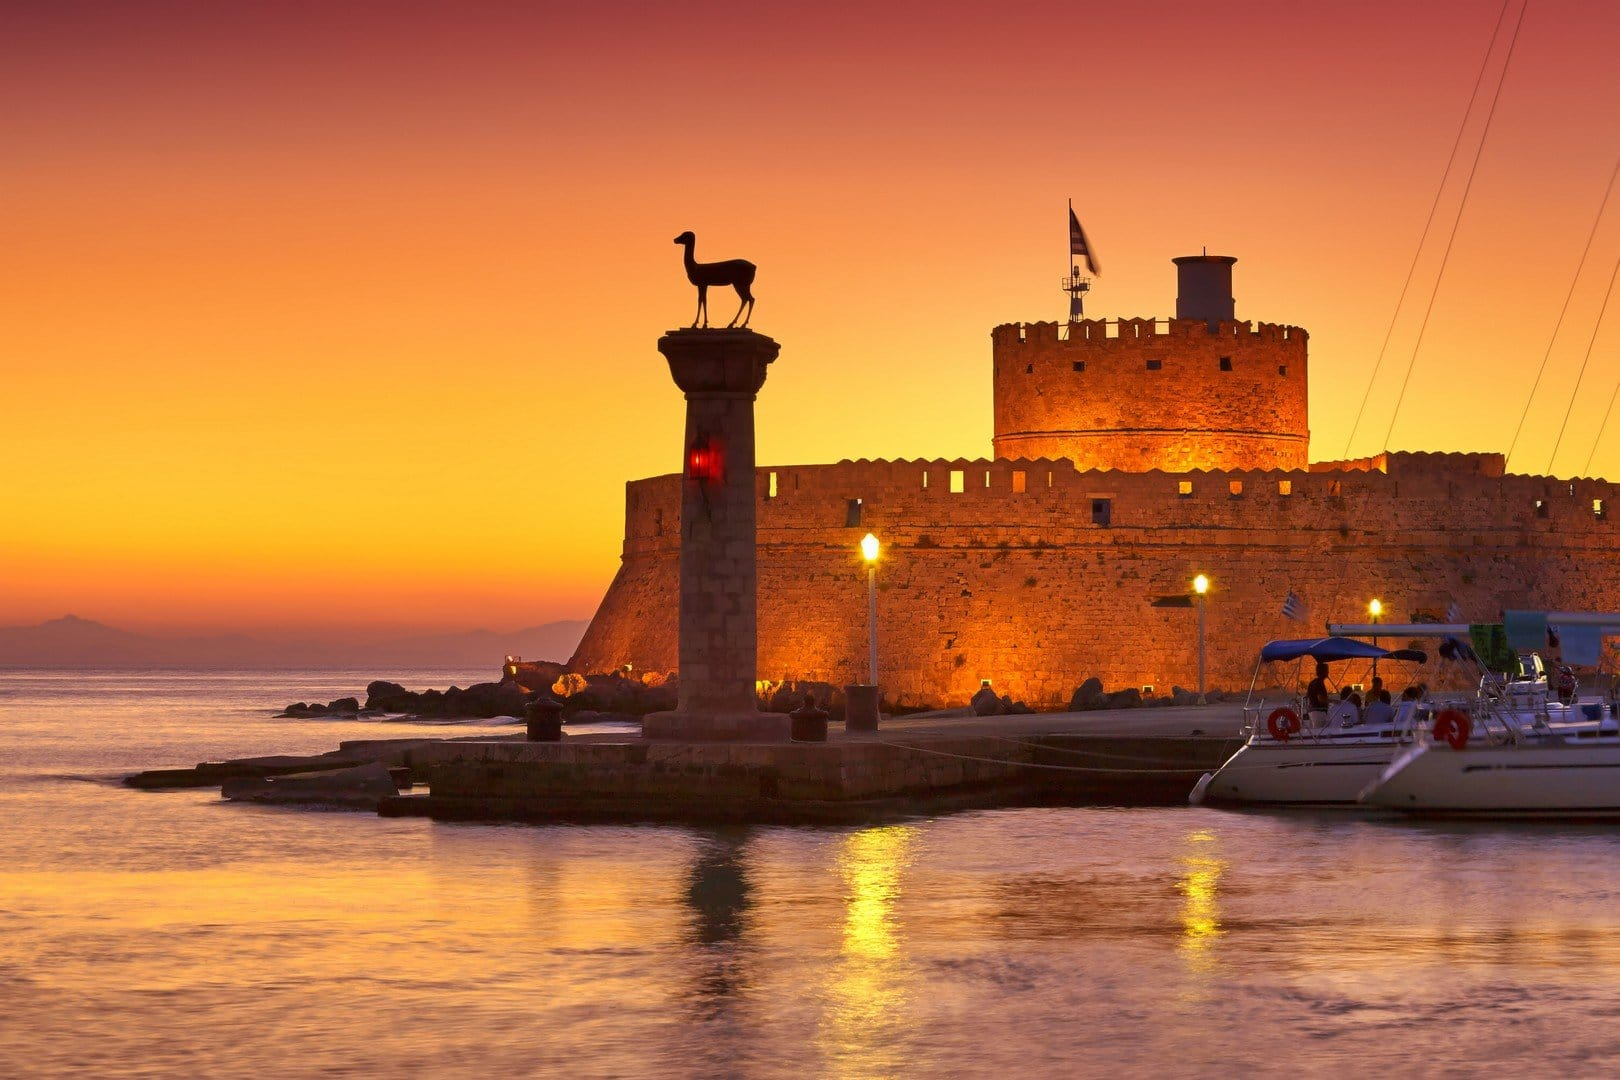 Mandraki harbor, Rhodes Island, Greece - Imagen shutterstock_306335021